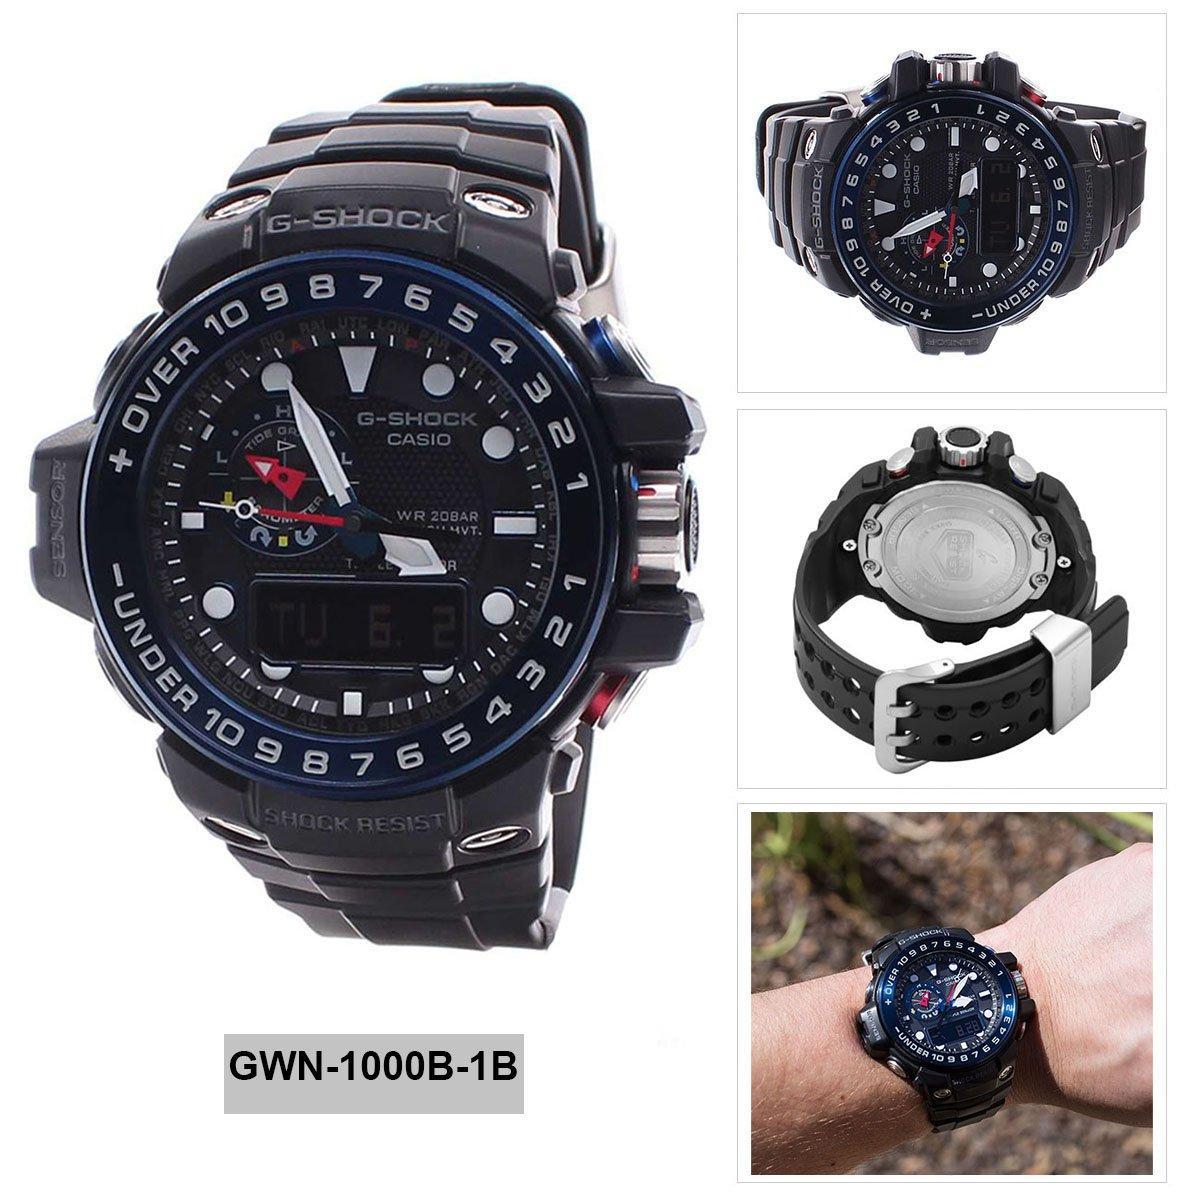 Sale Casio Watch G Shock Gulfmaster Black Resin Case Resin Strap Mens Gwn 1000B 1B Casio G Shock Cheap